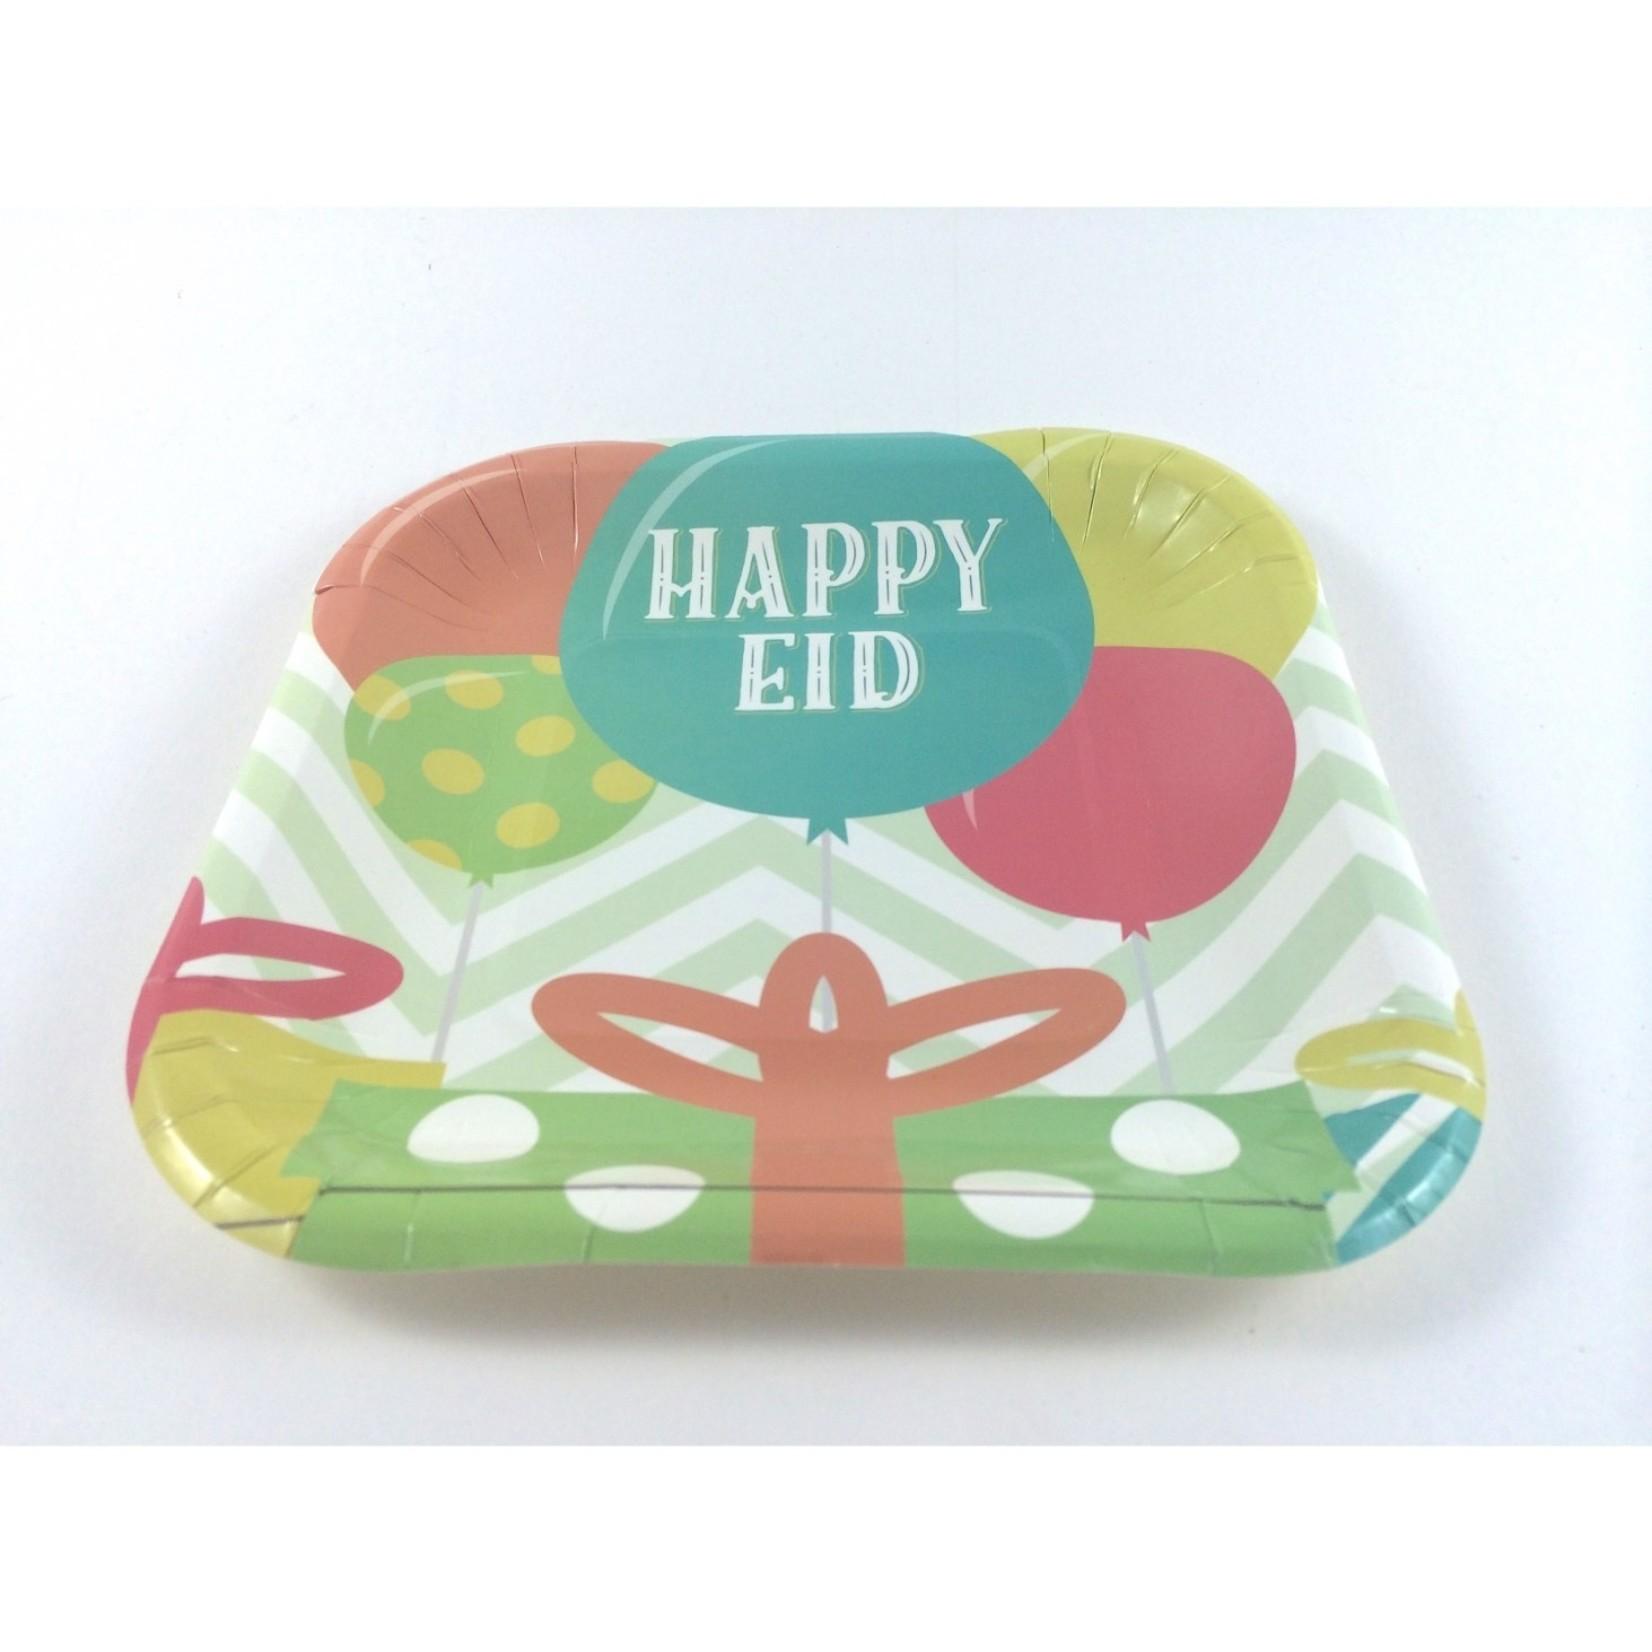 Eid Creations Eid Party Dessert Plates